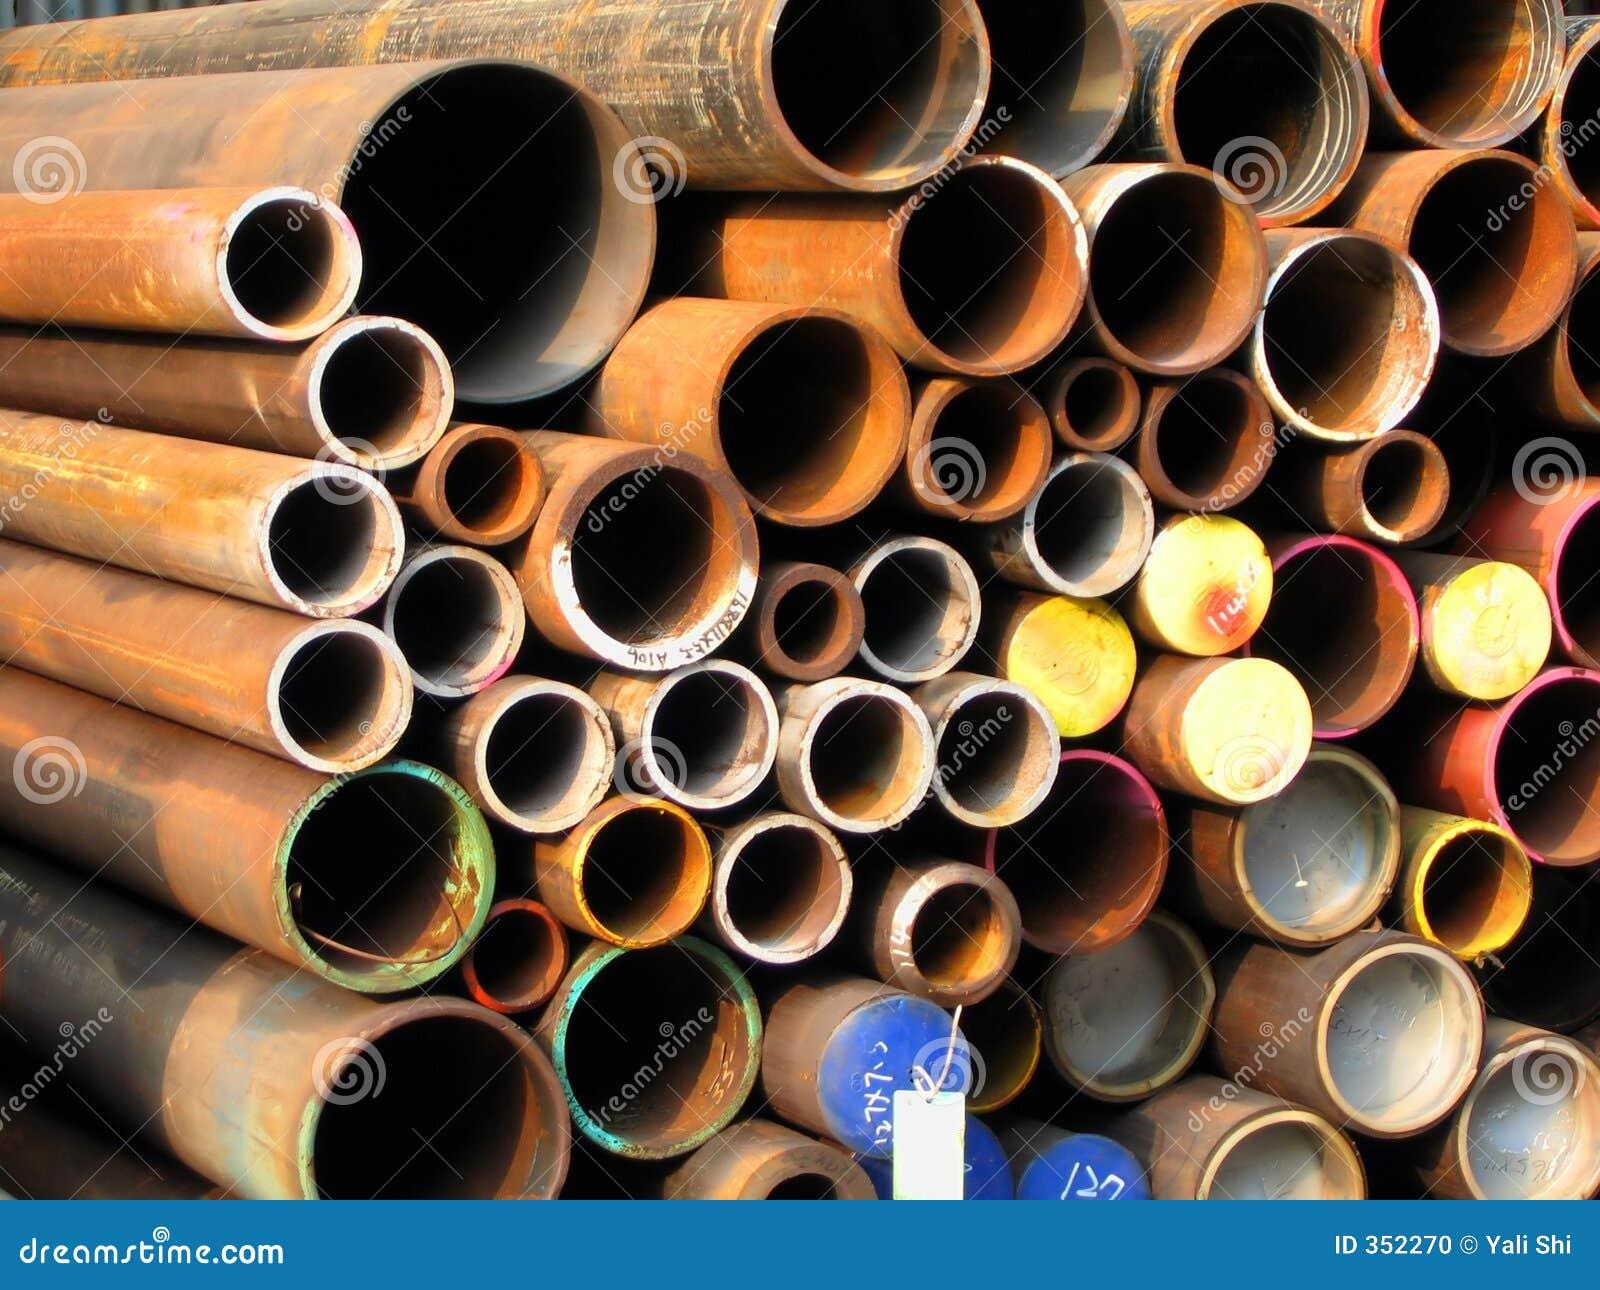 Rostige Stahlrohre